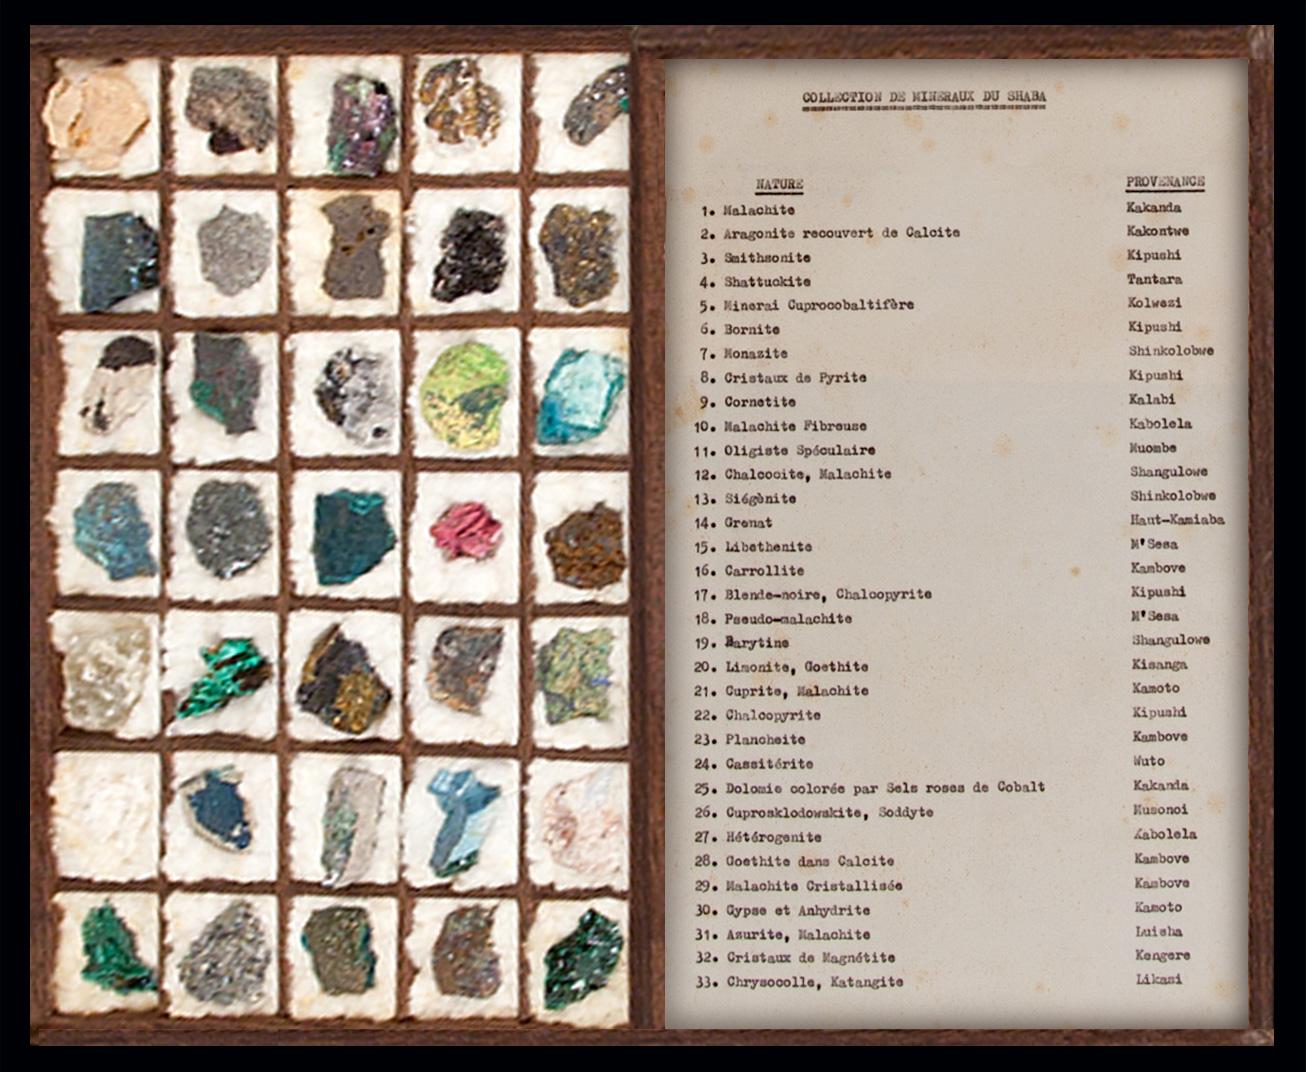 muestras minerales, katanga